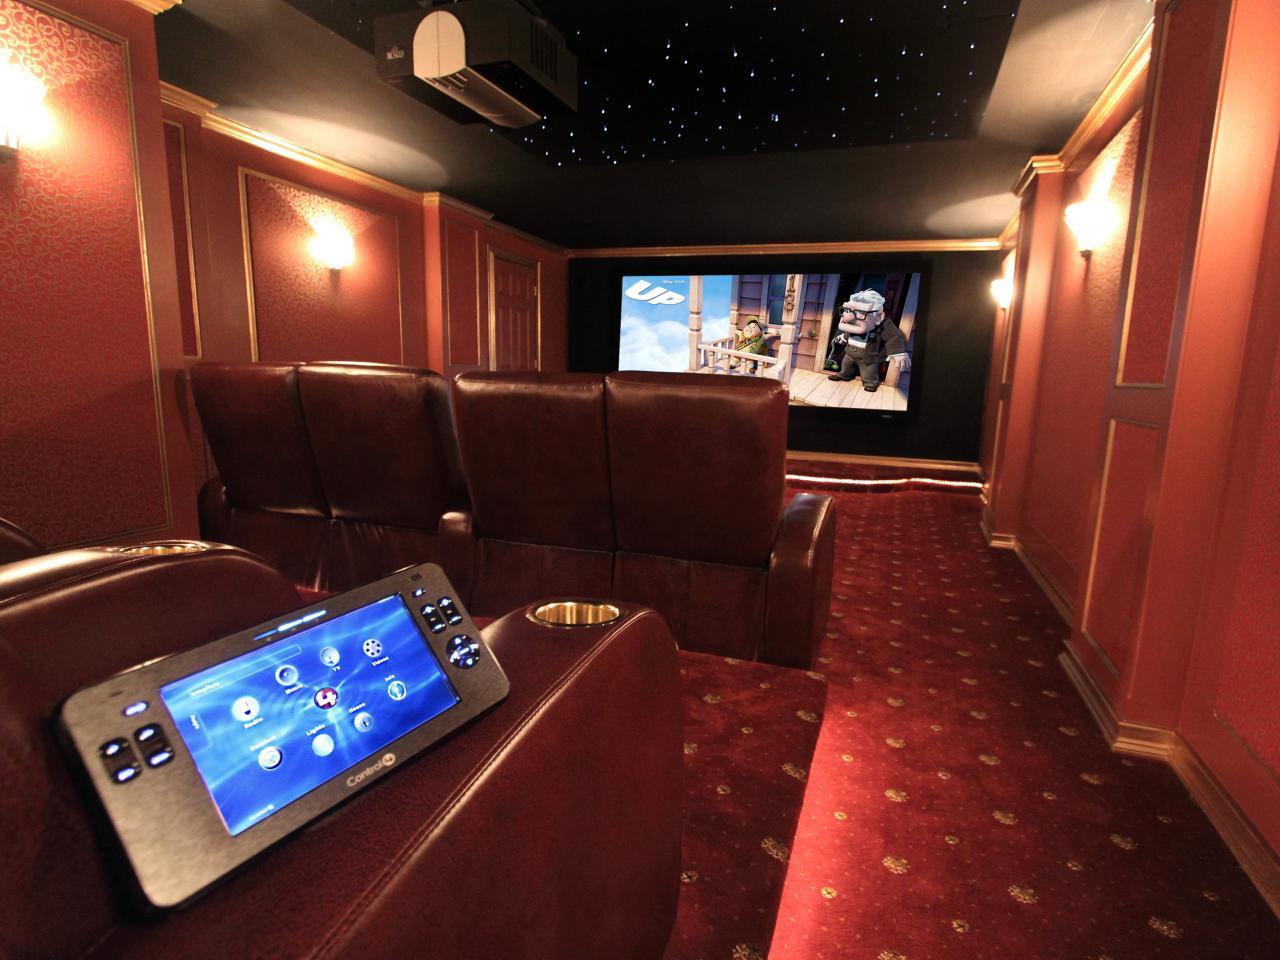 Home Theater Remote Controls